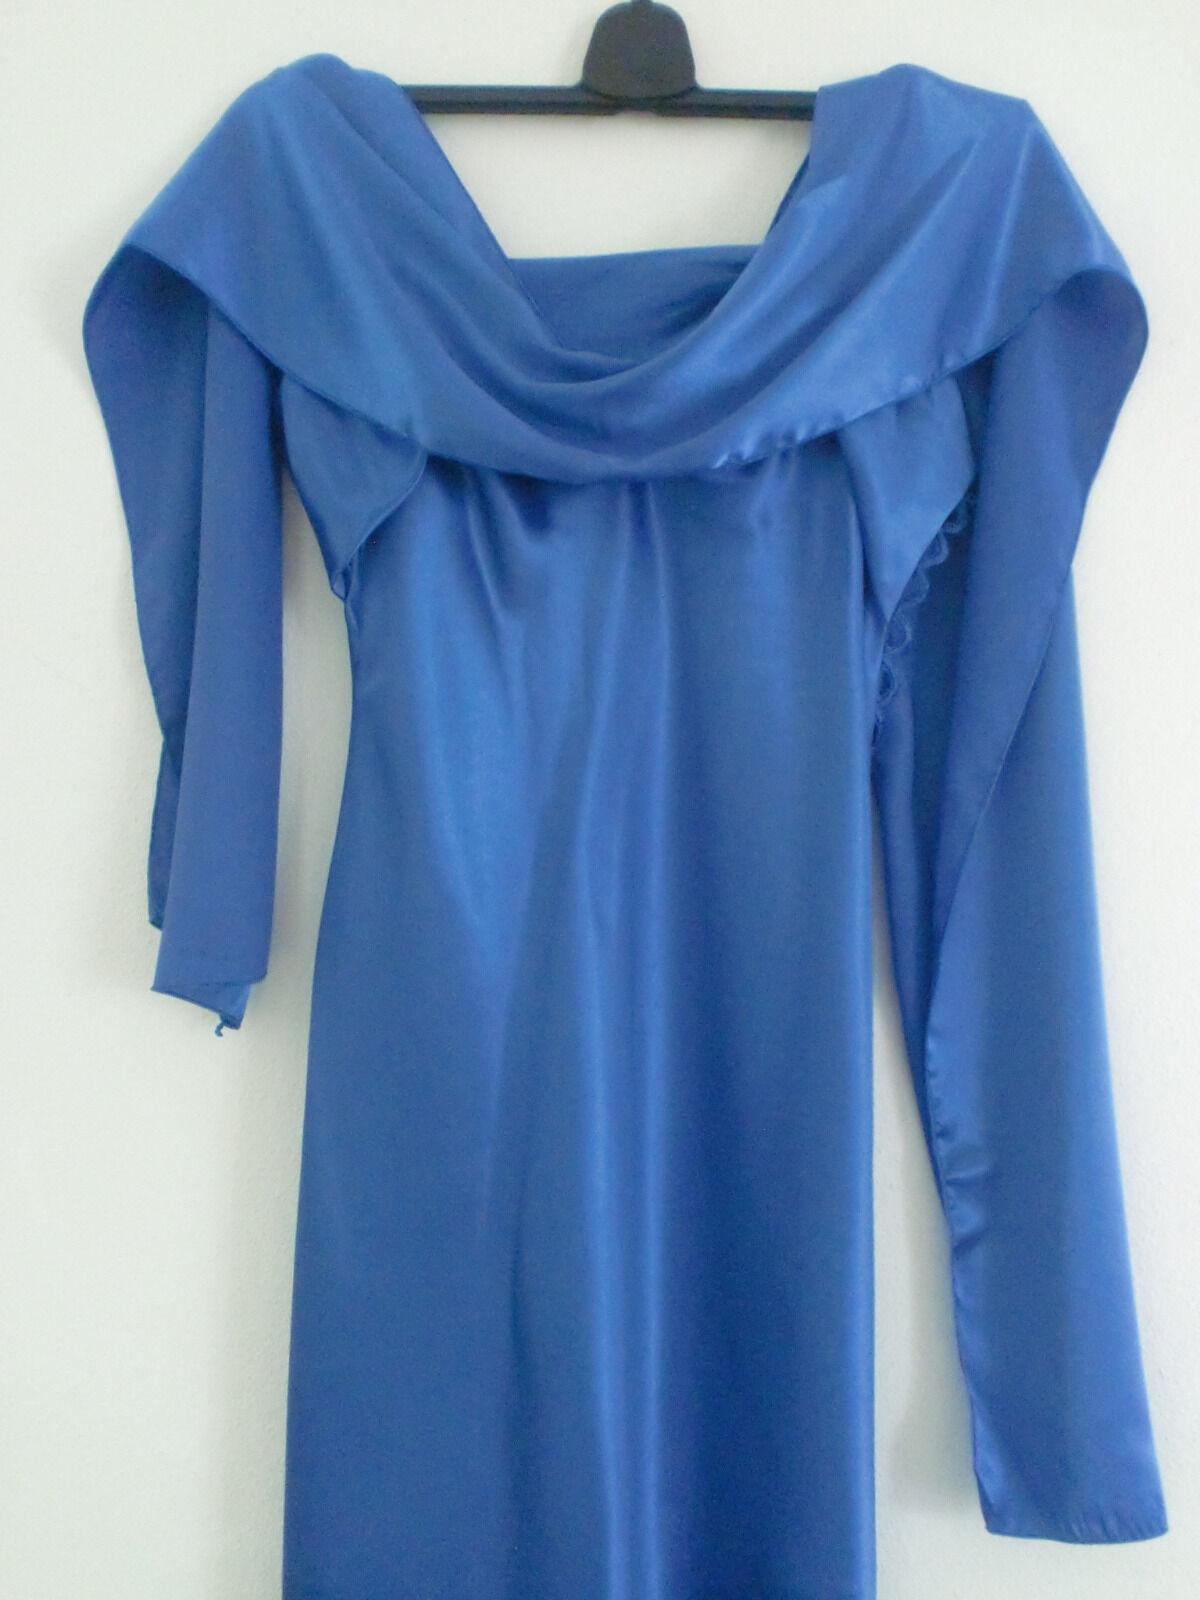 Damen Abendkleid in blau Gr.M